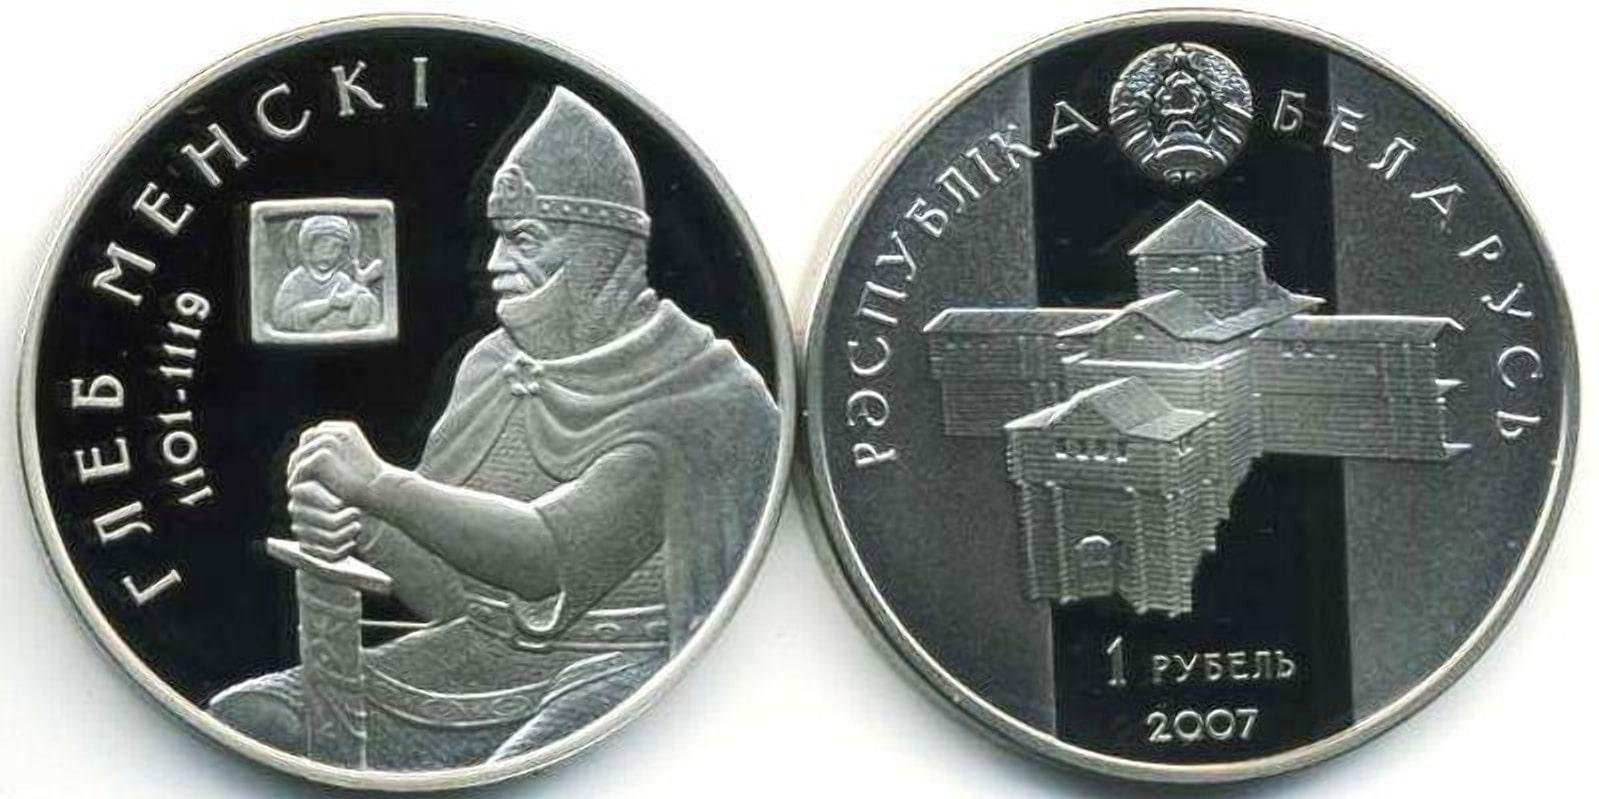 Памятная монета Национального Банка Беларуси